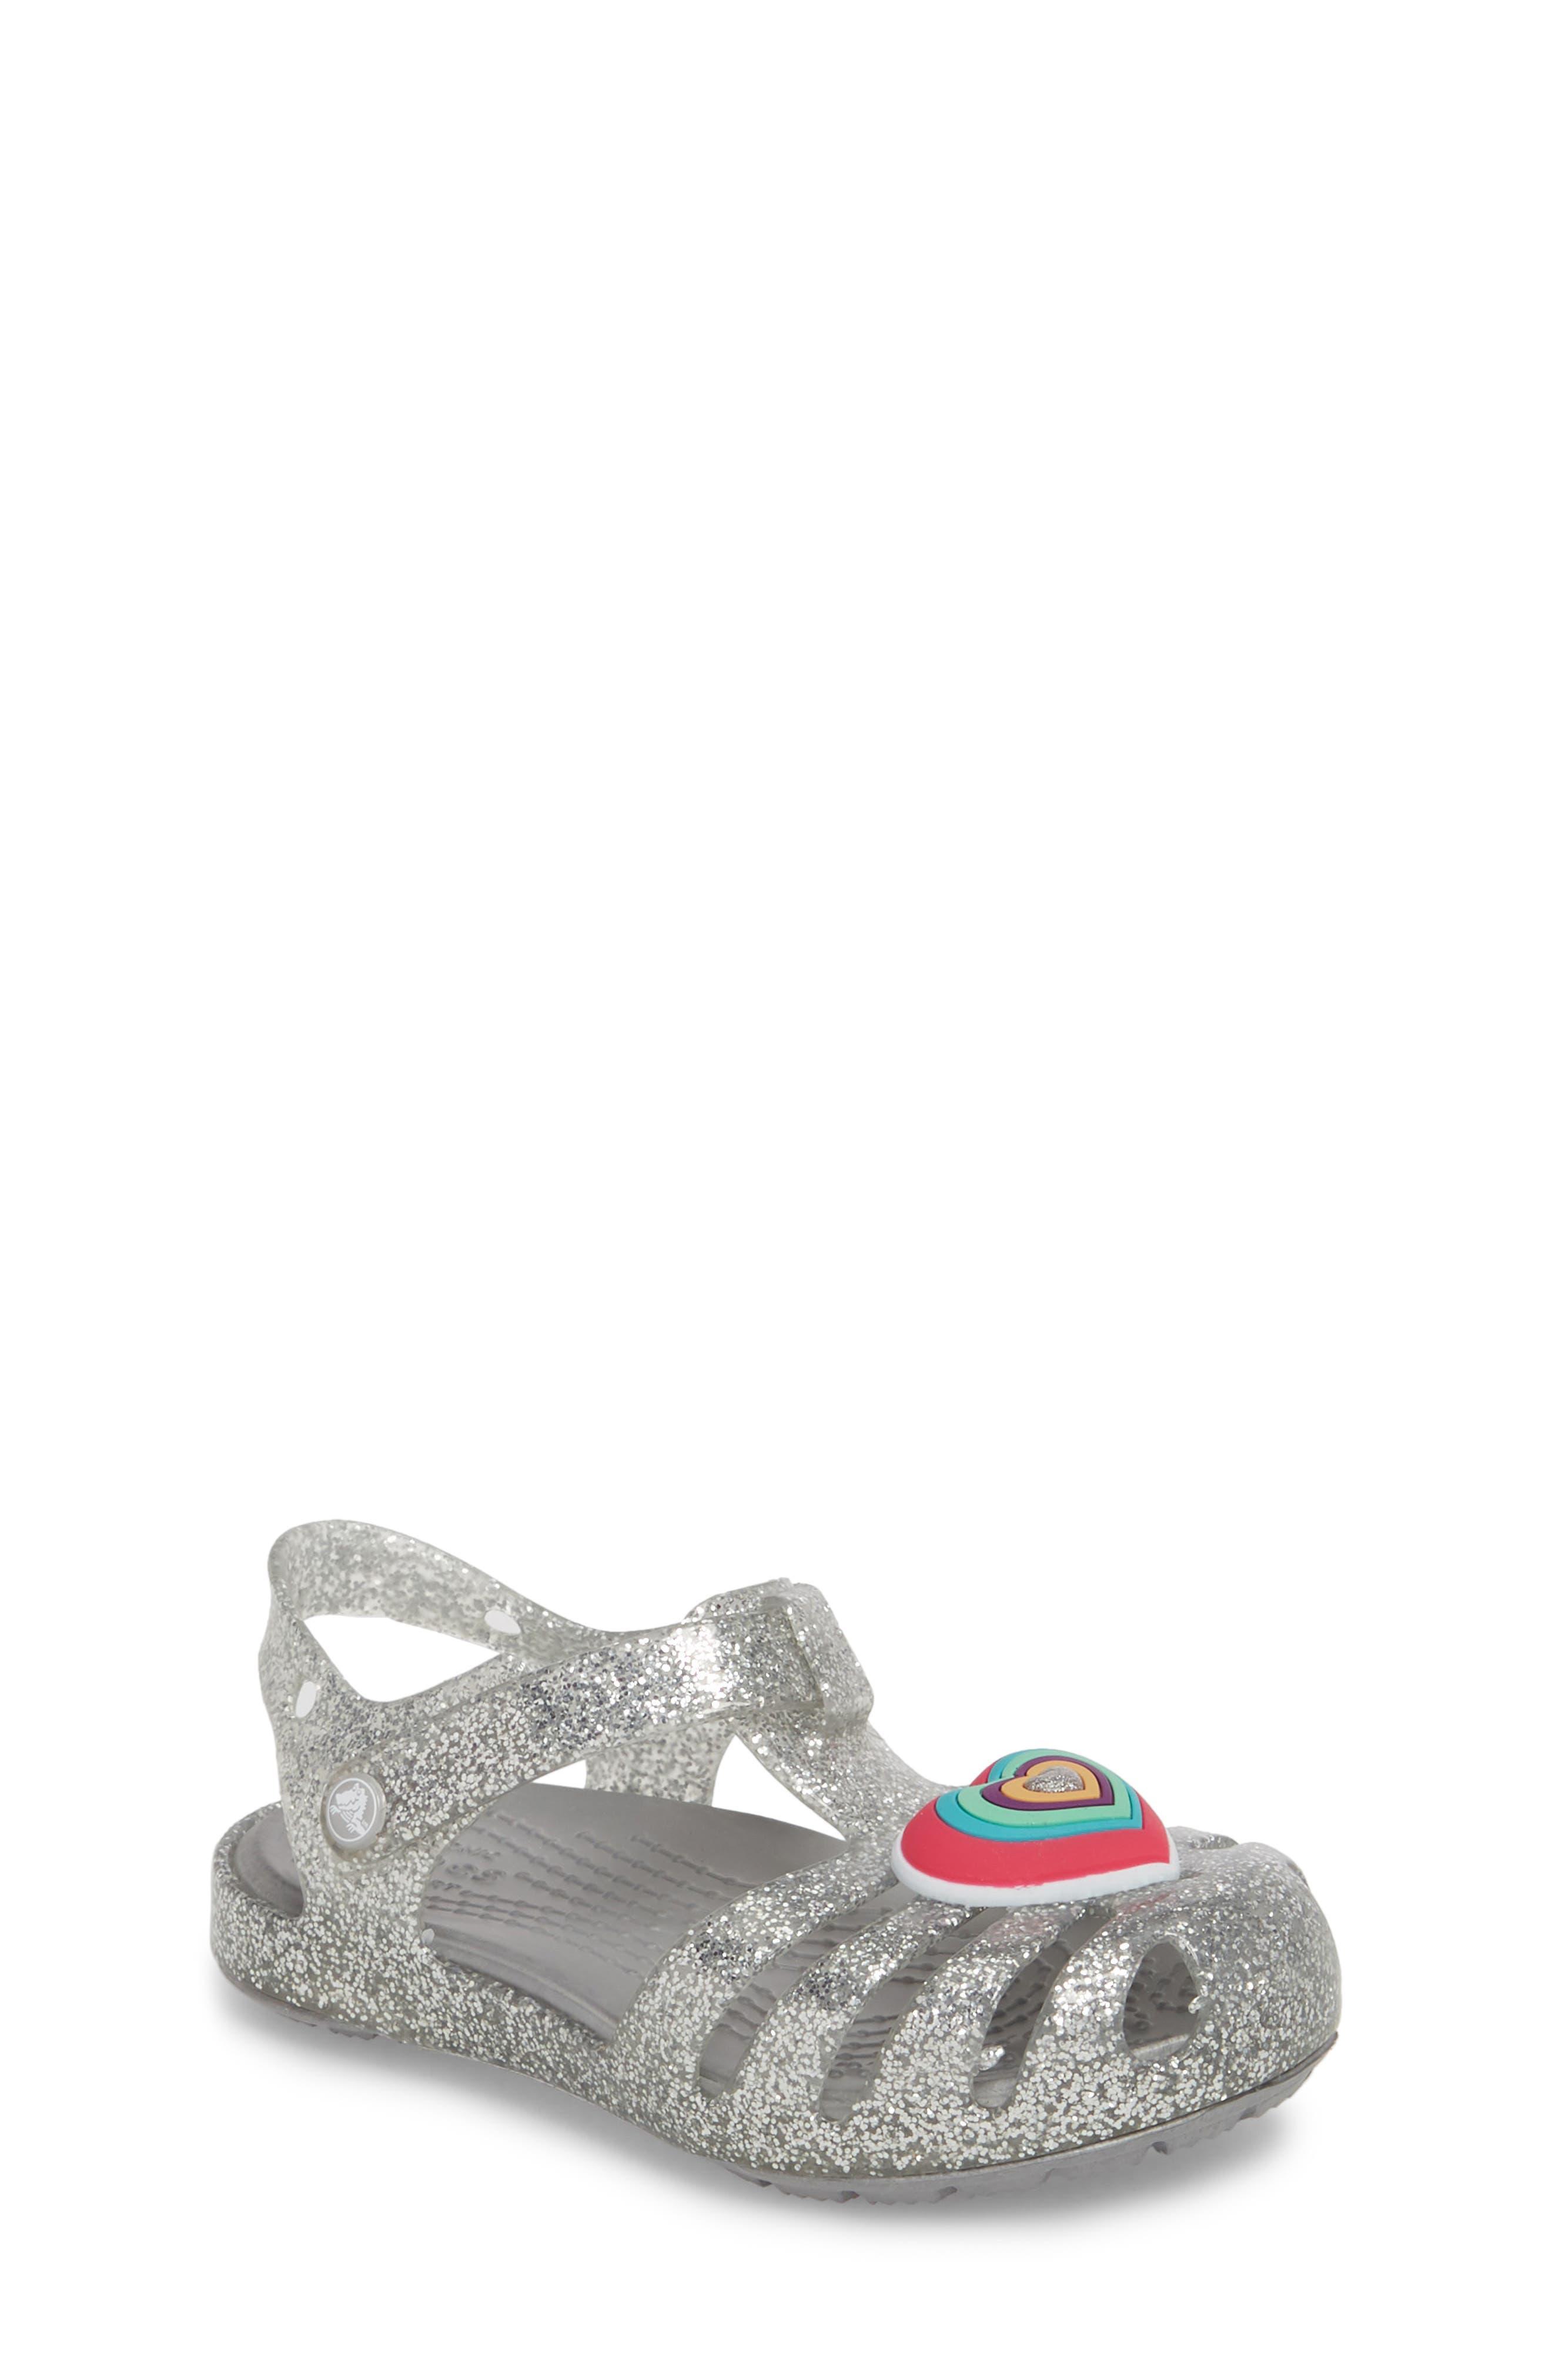 Isabella Glitter Fisherman Sandal,                         Main,                         color, Silver